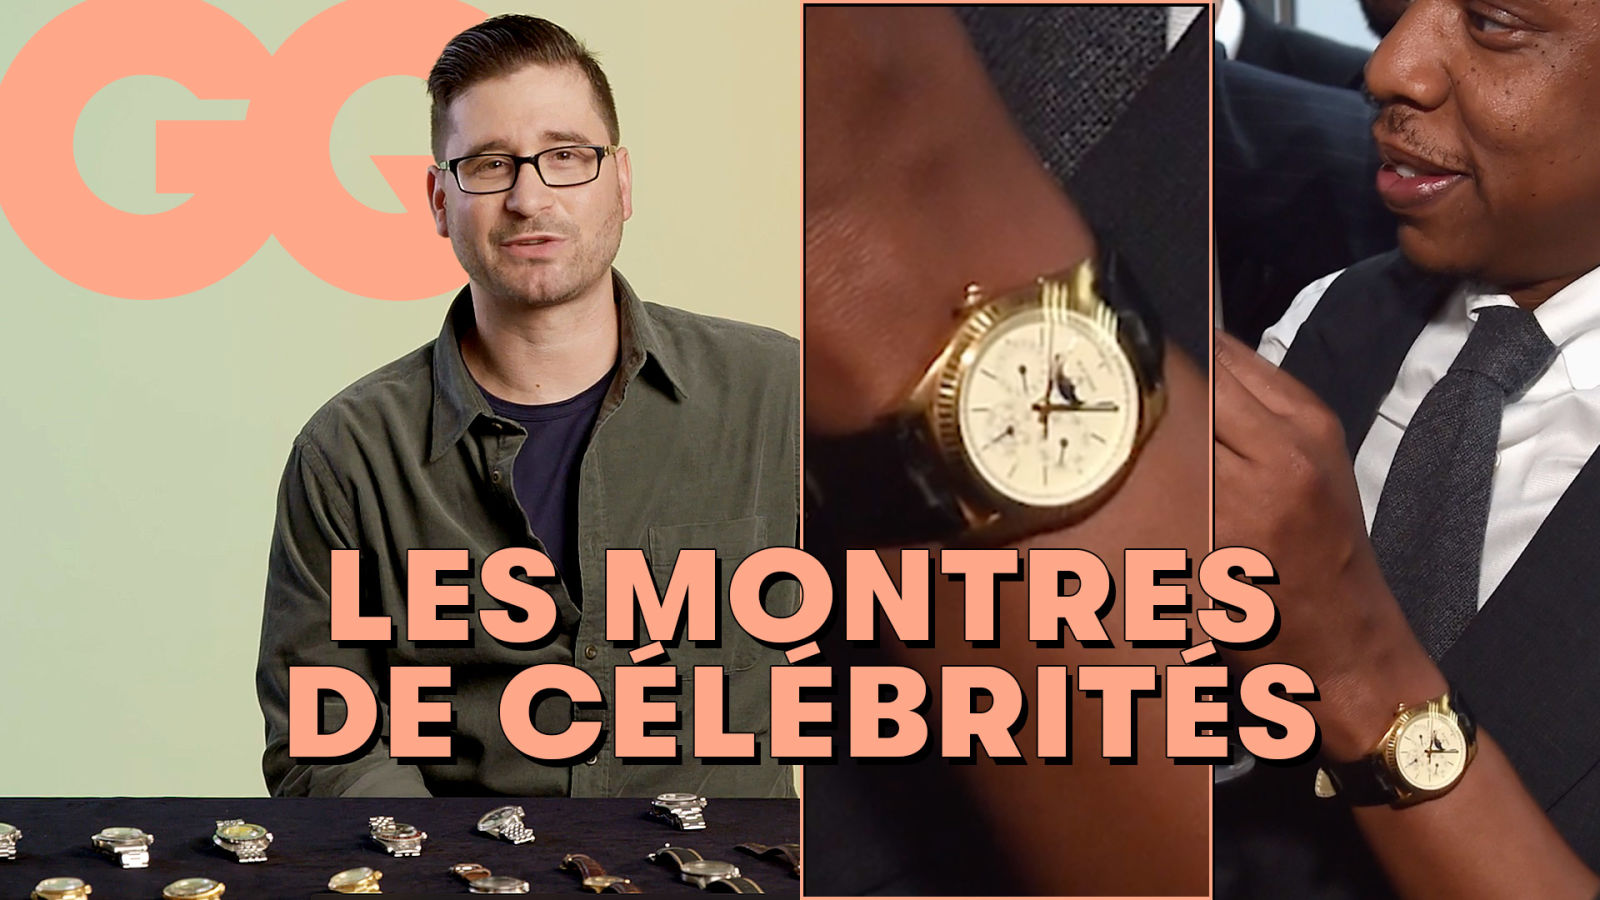 Un expert en horlogerie analyse des montres de stars : Kanye West, Ryan Gosling, Offset